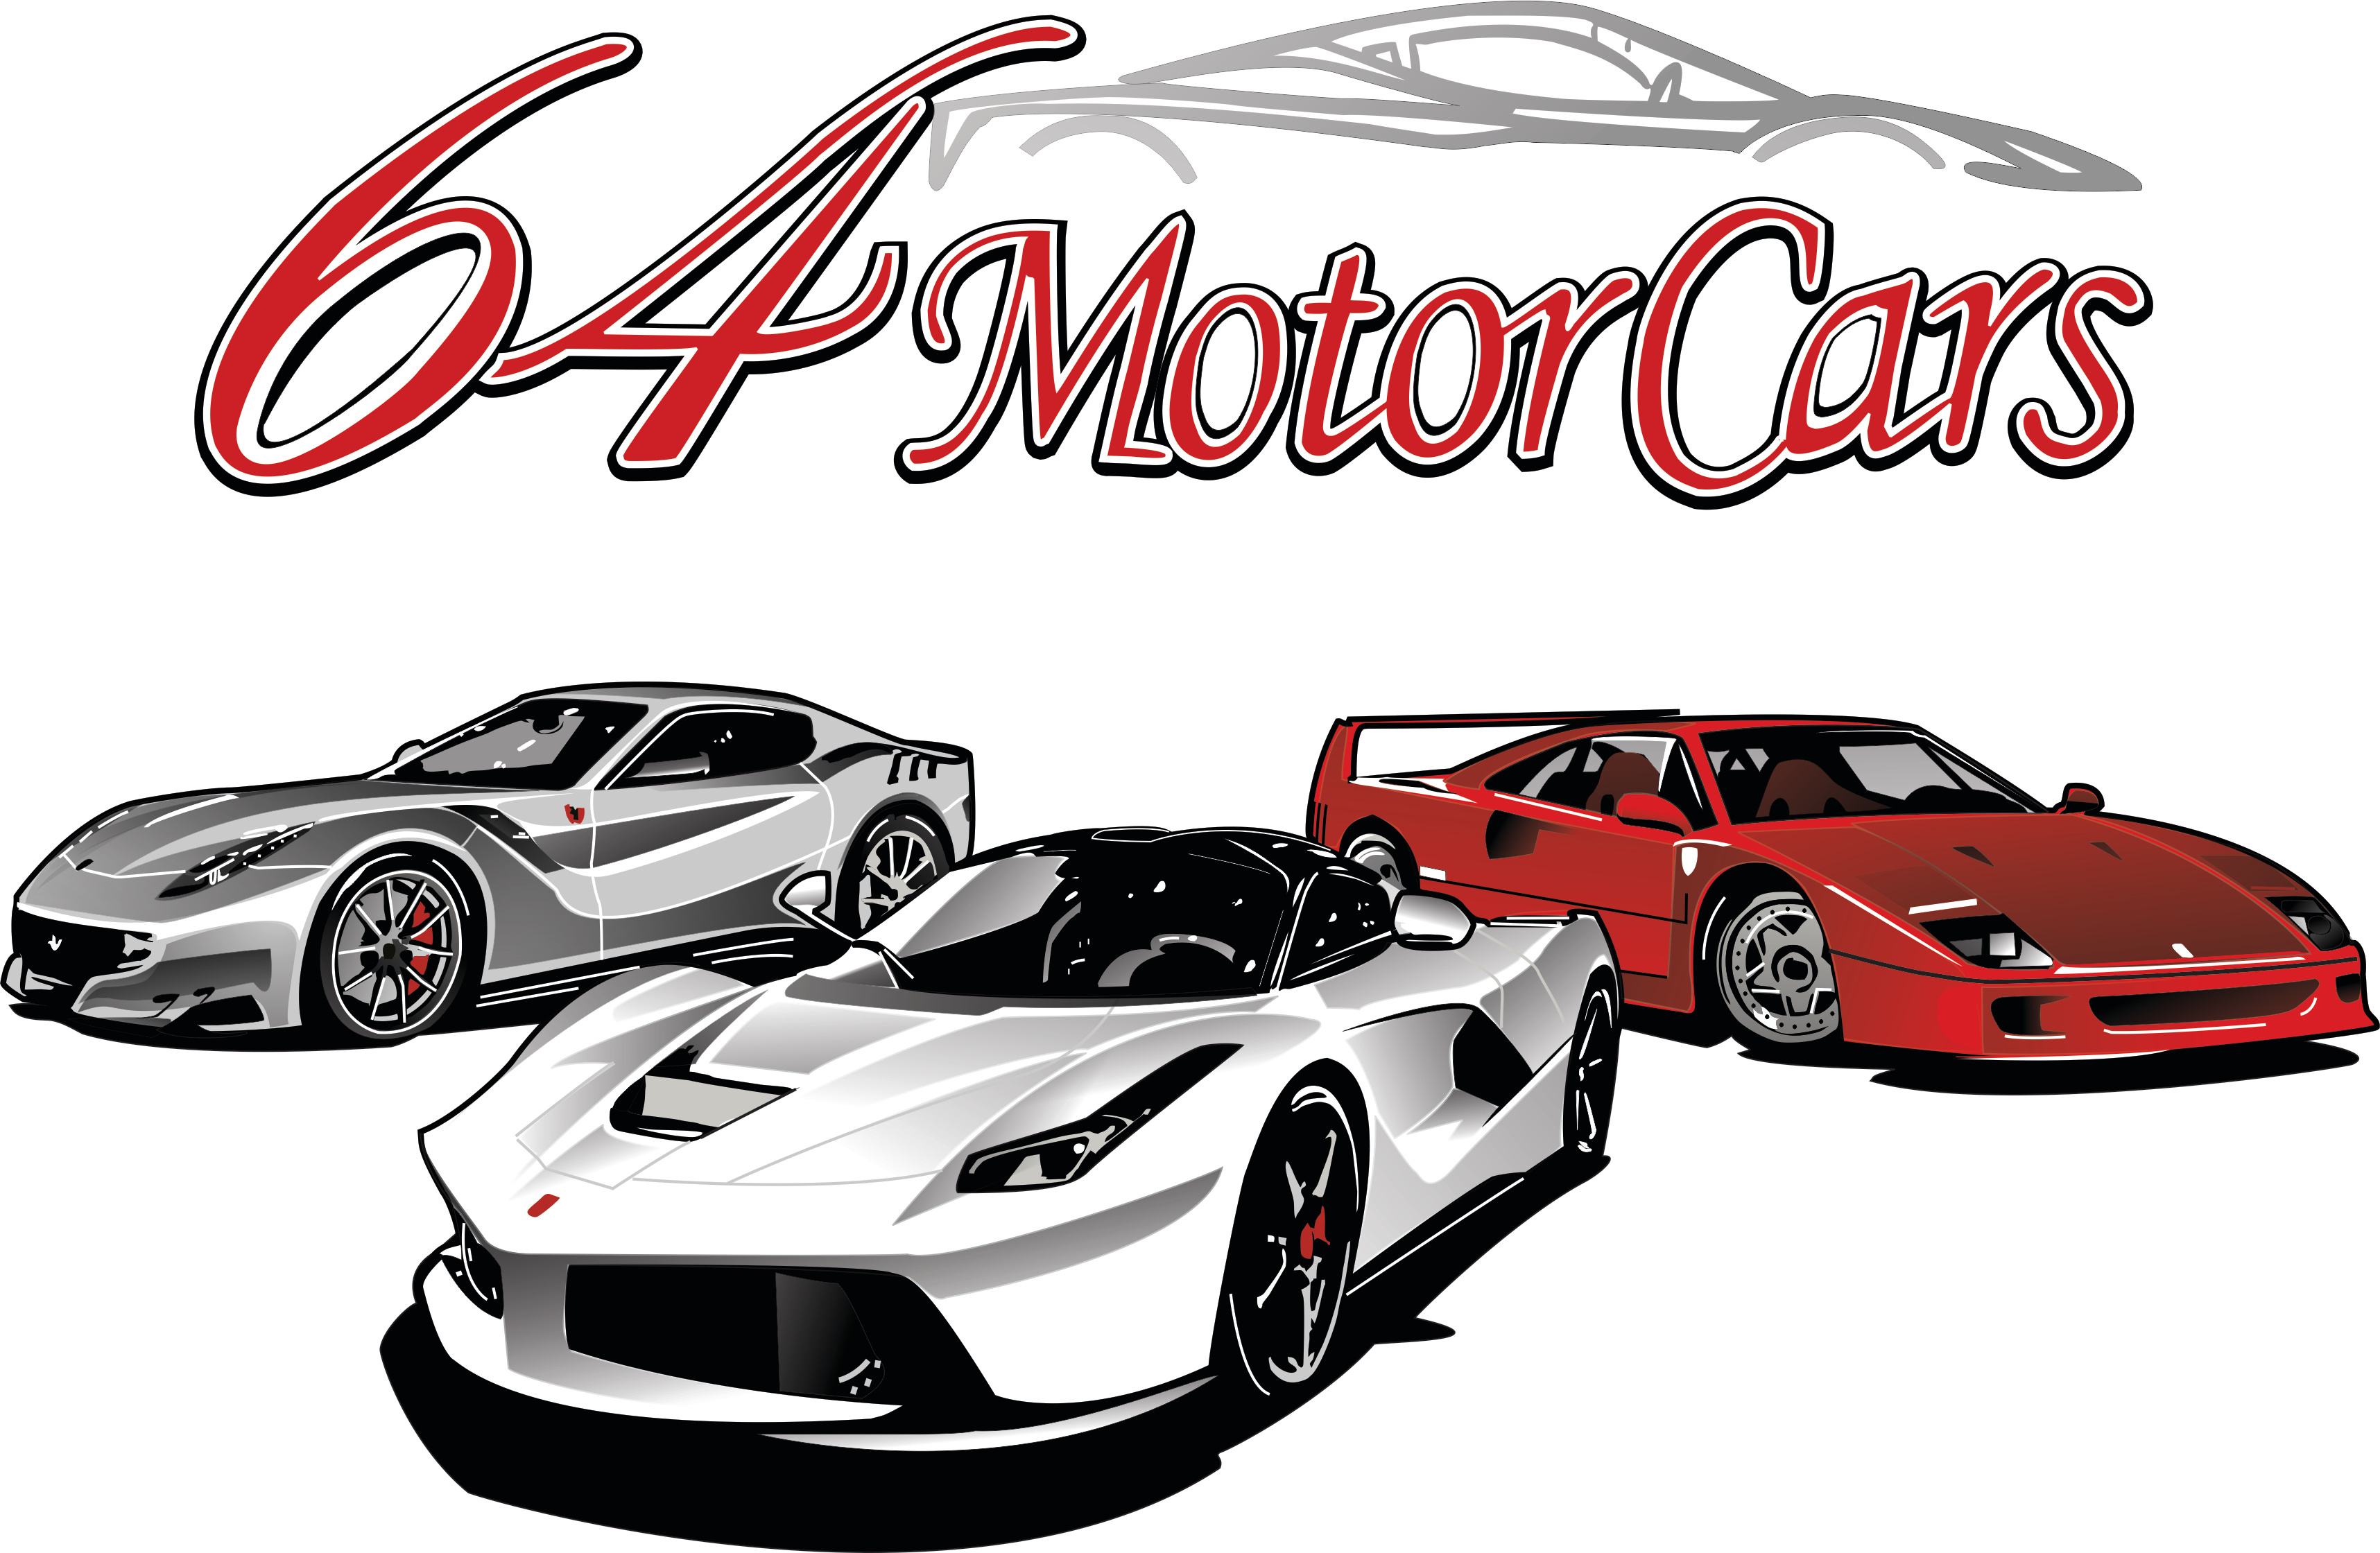 64 Motor Cars Design